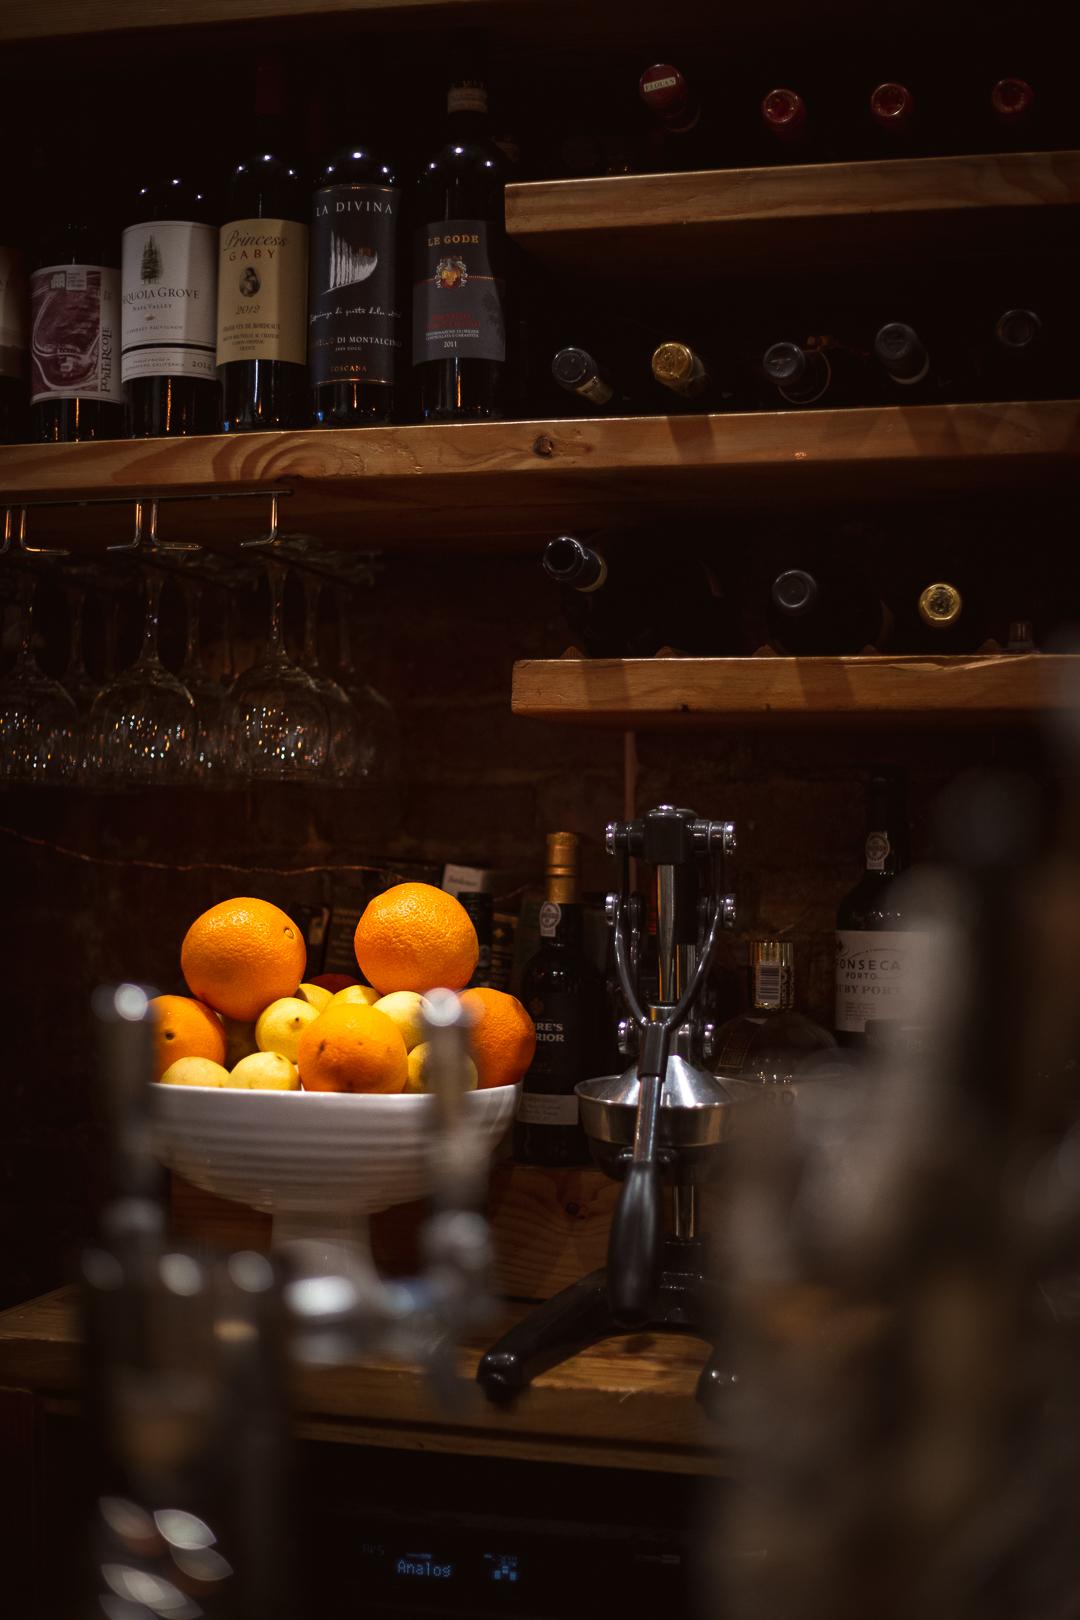 3 Giovani - NYC Italian Restaurant - Bar 2.jpg